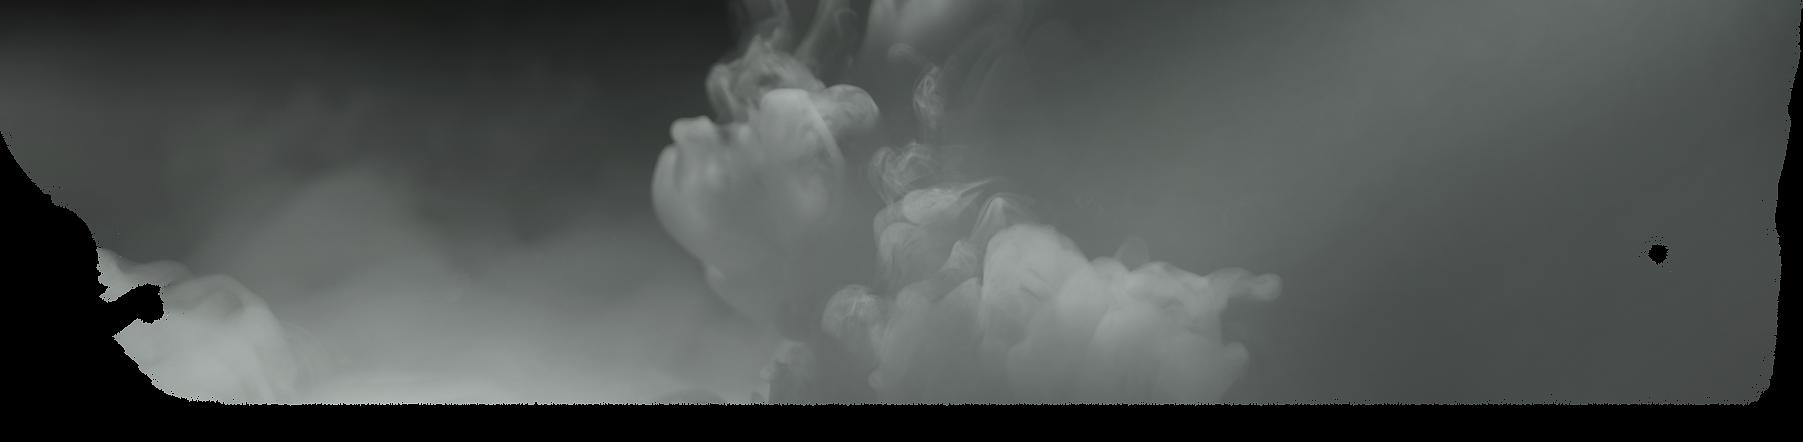 smoke-retrocity.png